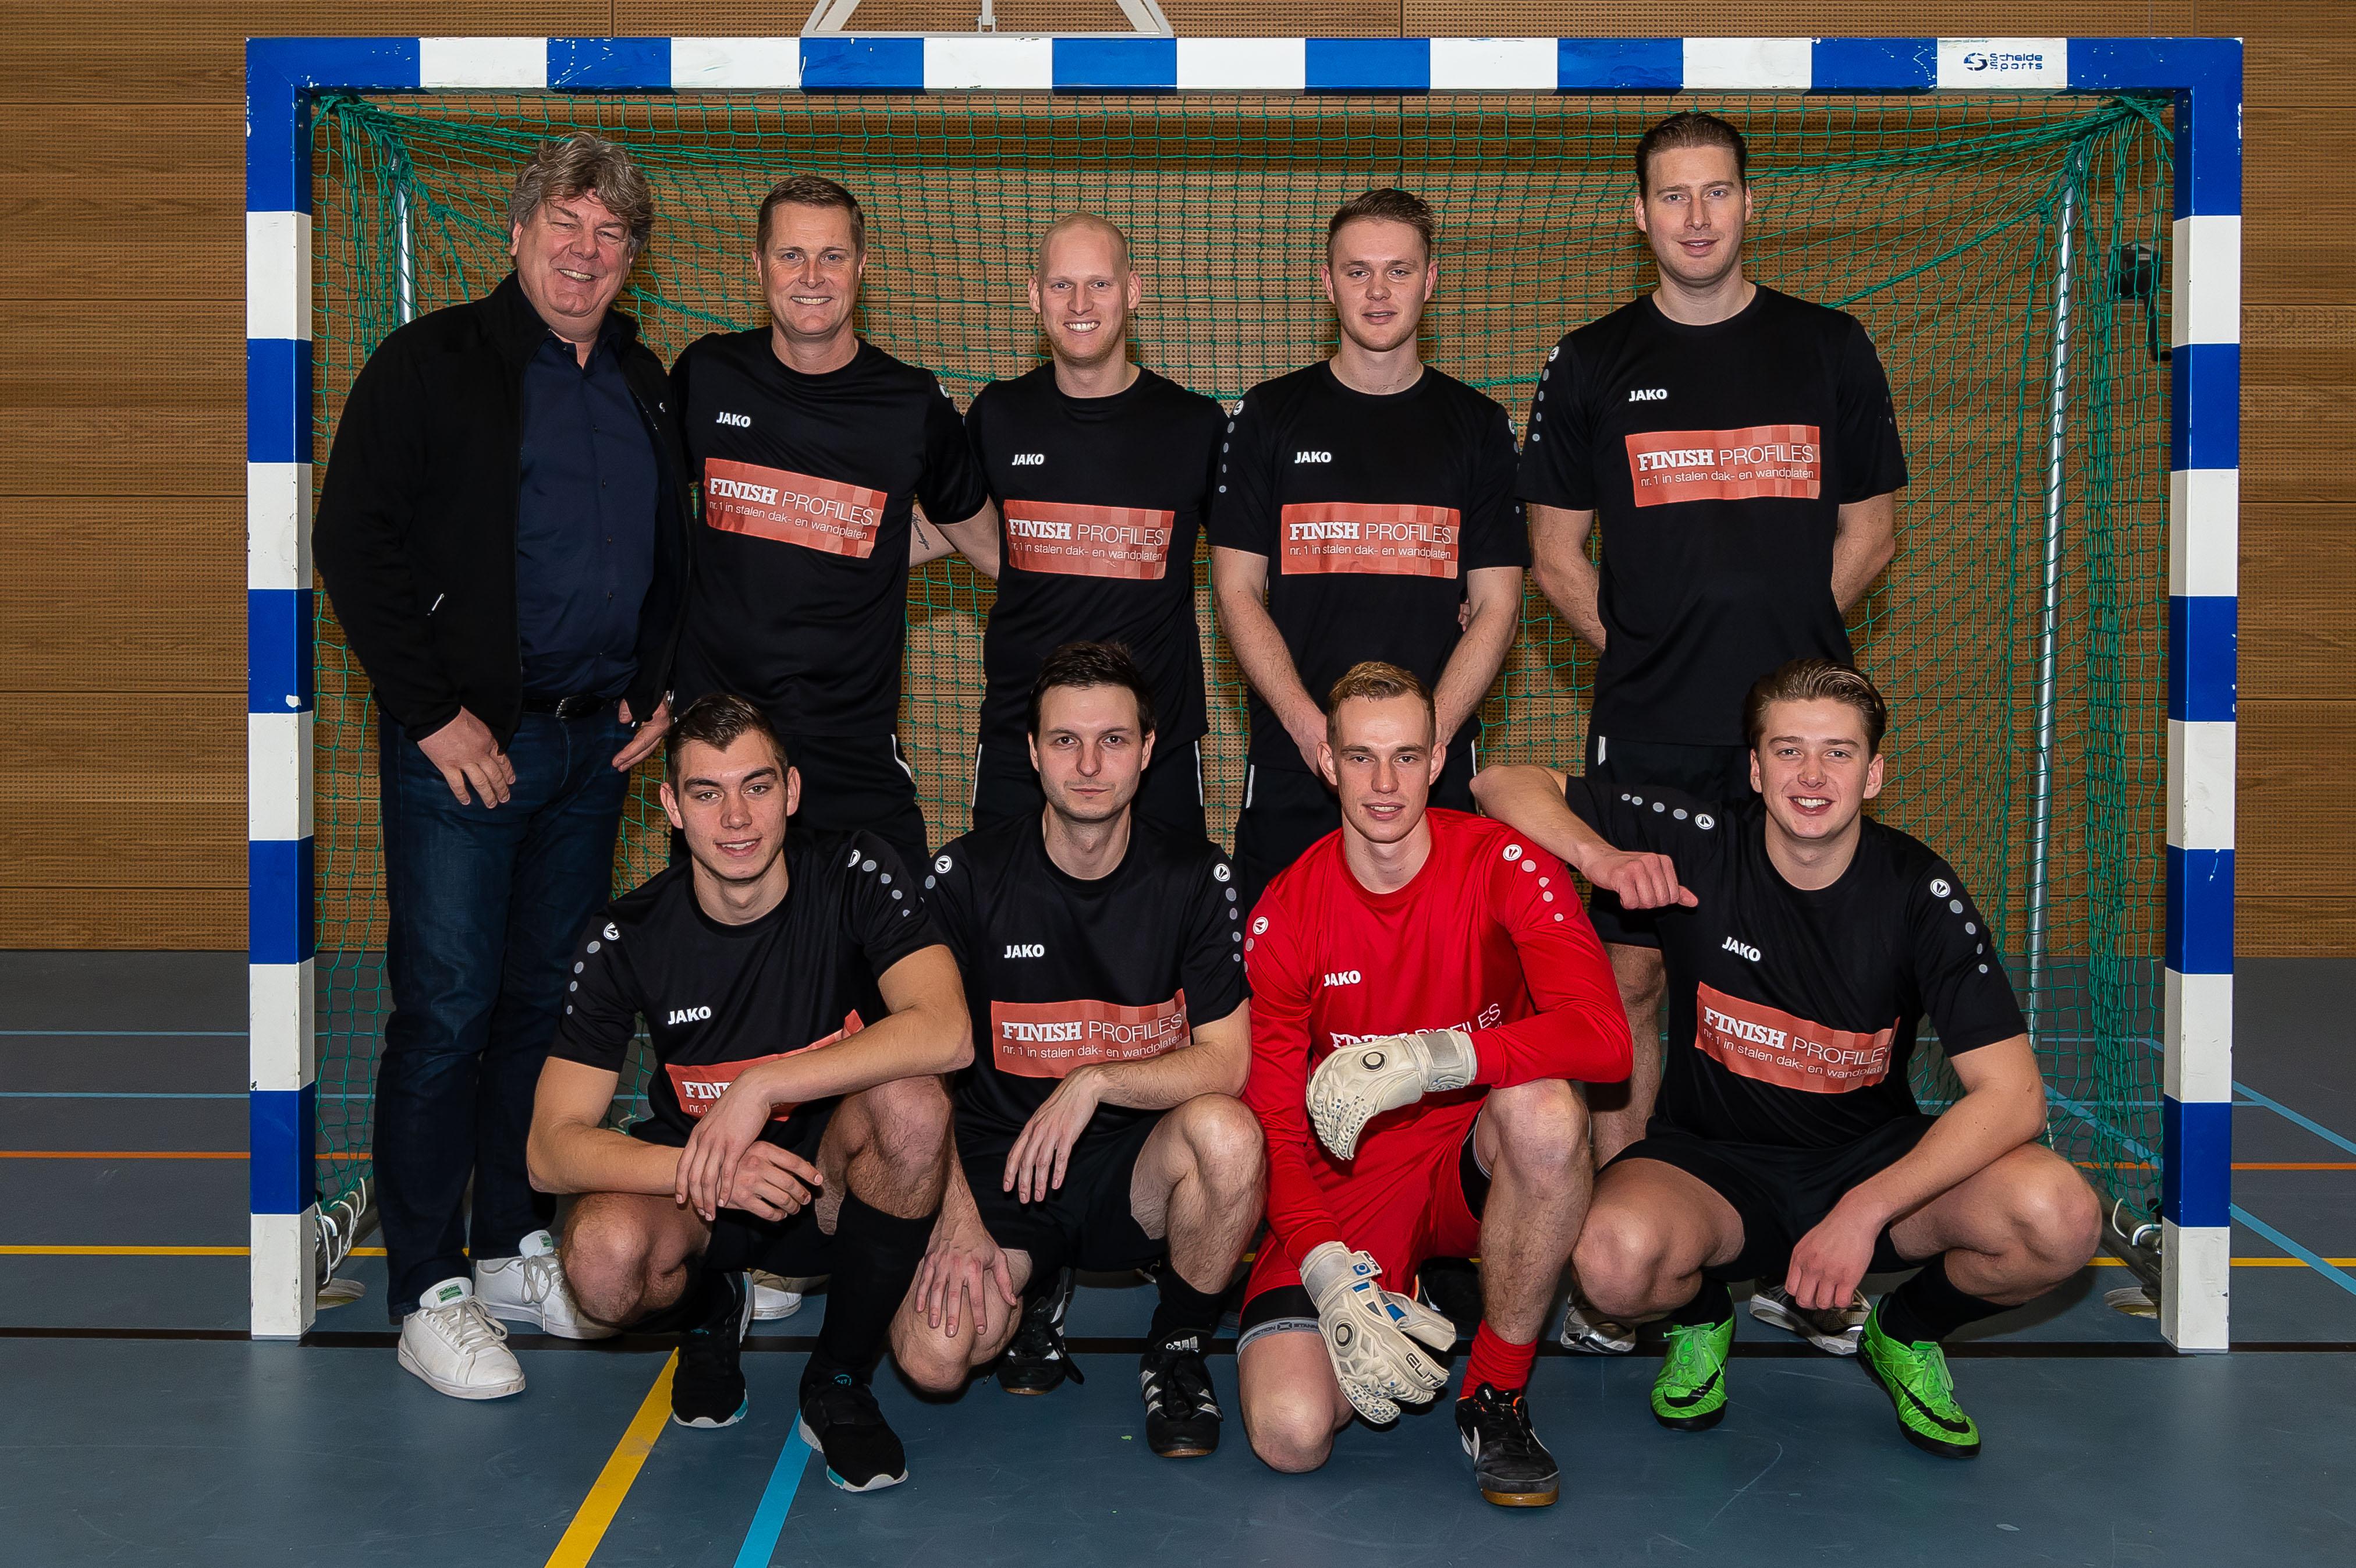 Het winnende team met de Finish Profiles Cup. (Foto: Han Giskes) rodi.nl © rodi